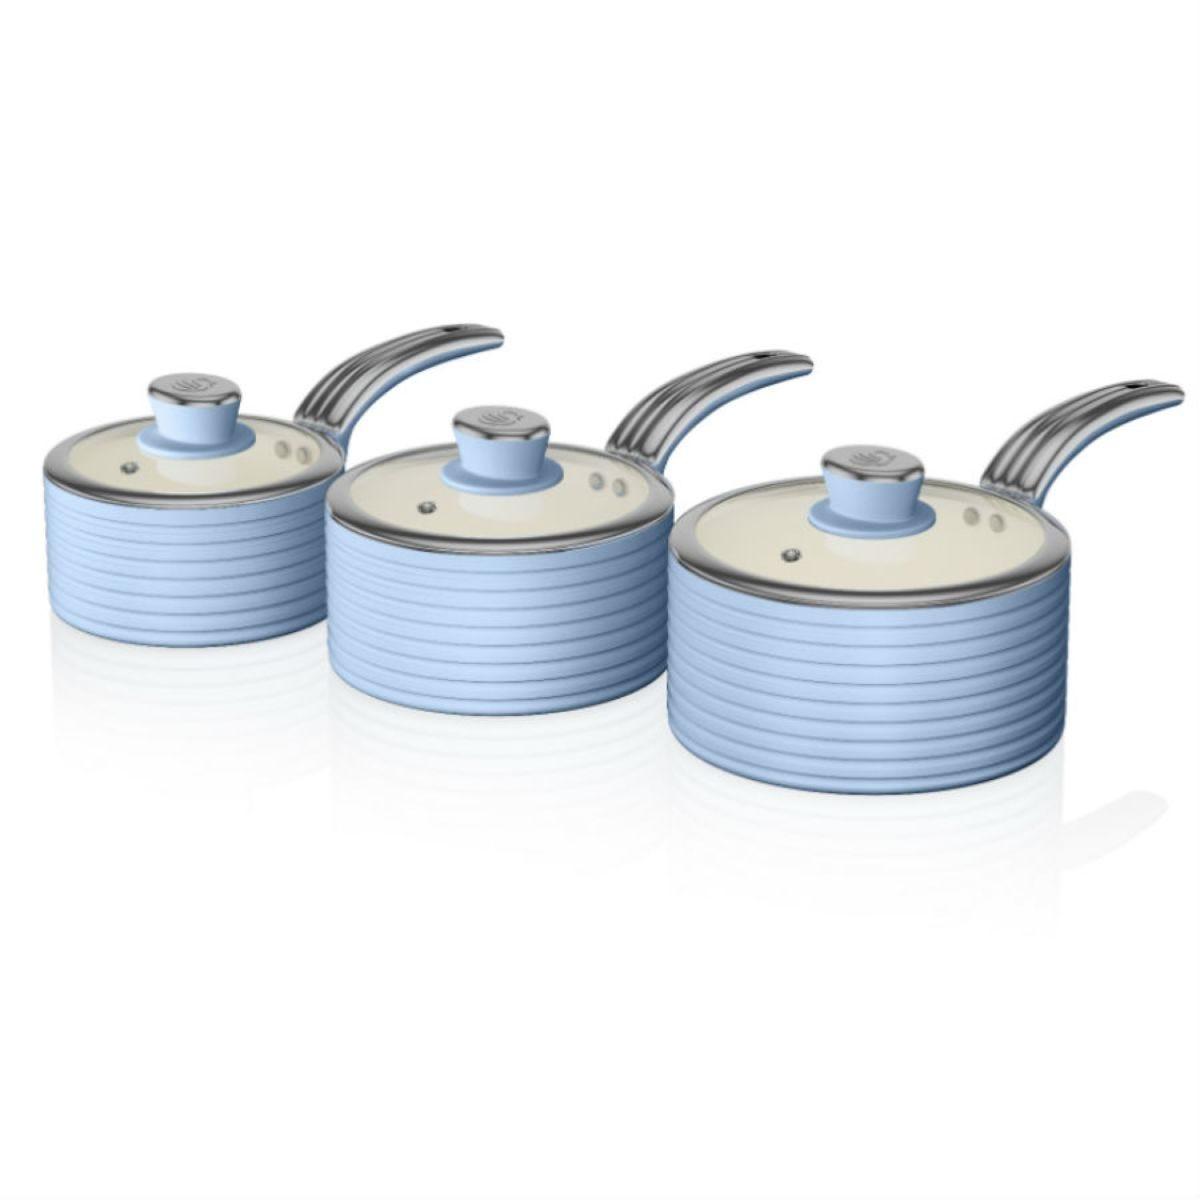 Swan Retro 3 Piece Saucepan Set – Blue